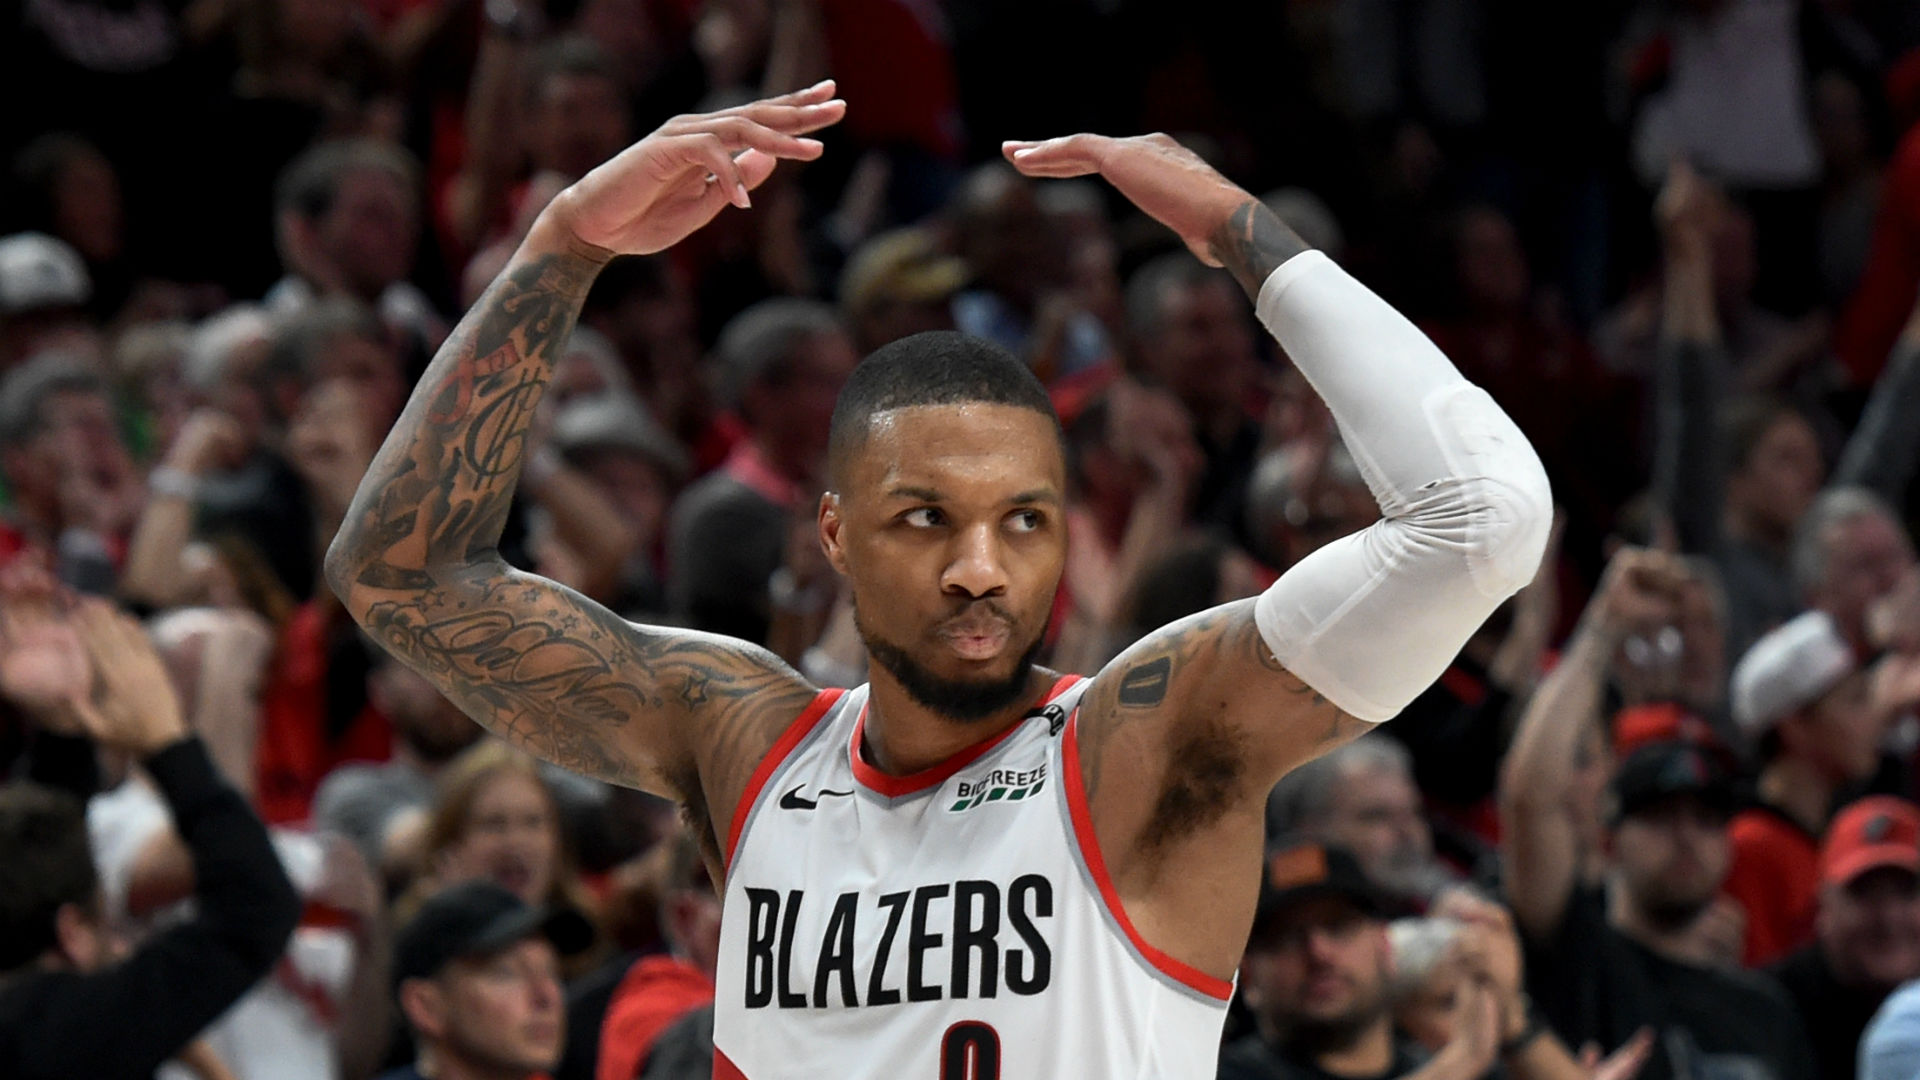 Nba Playoffs 2019 Damian Lillard Warns Blazers Up 2 0